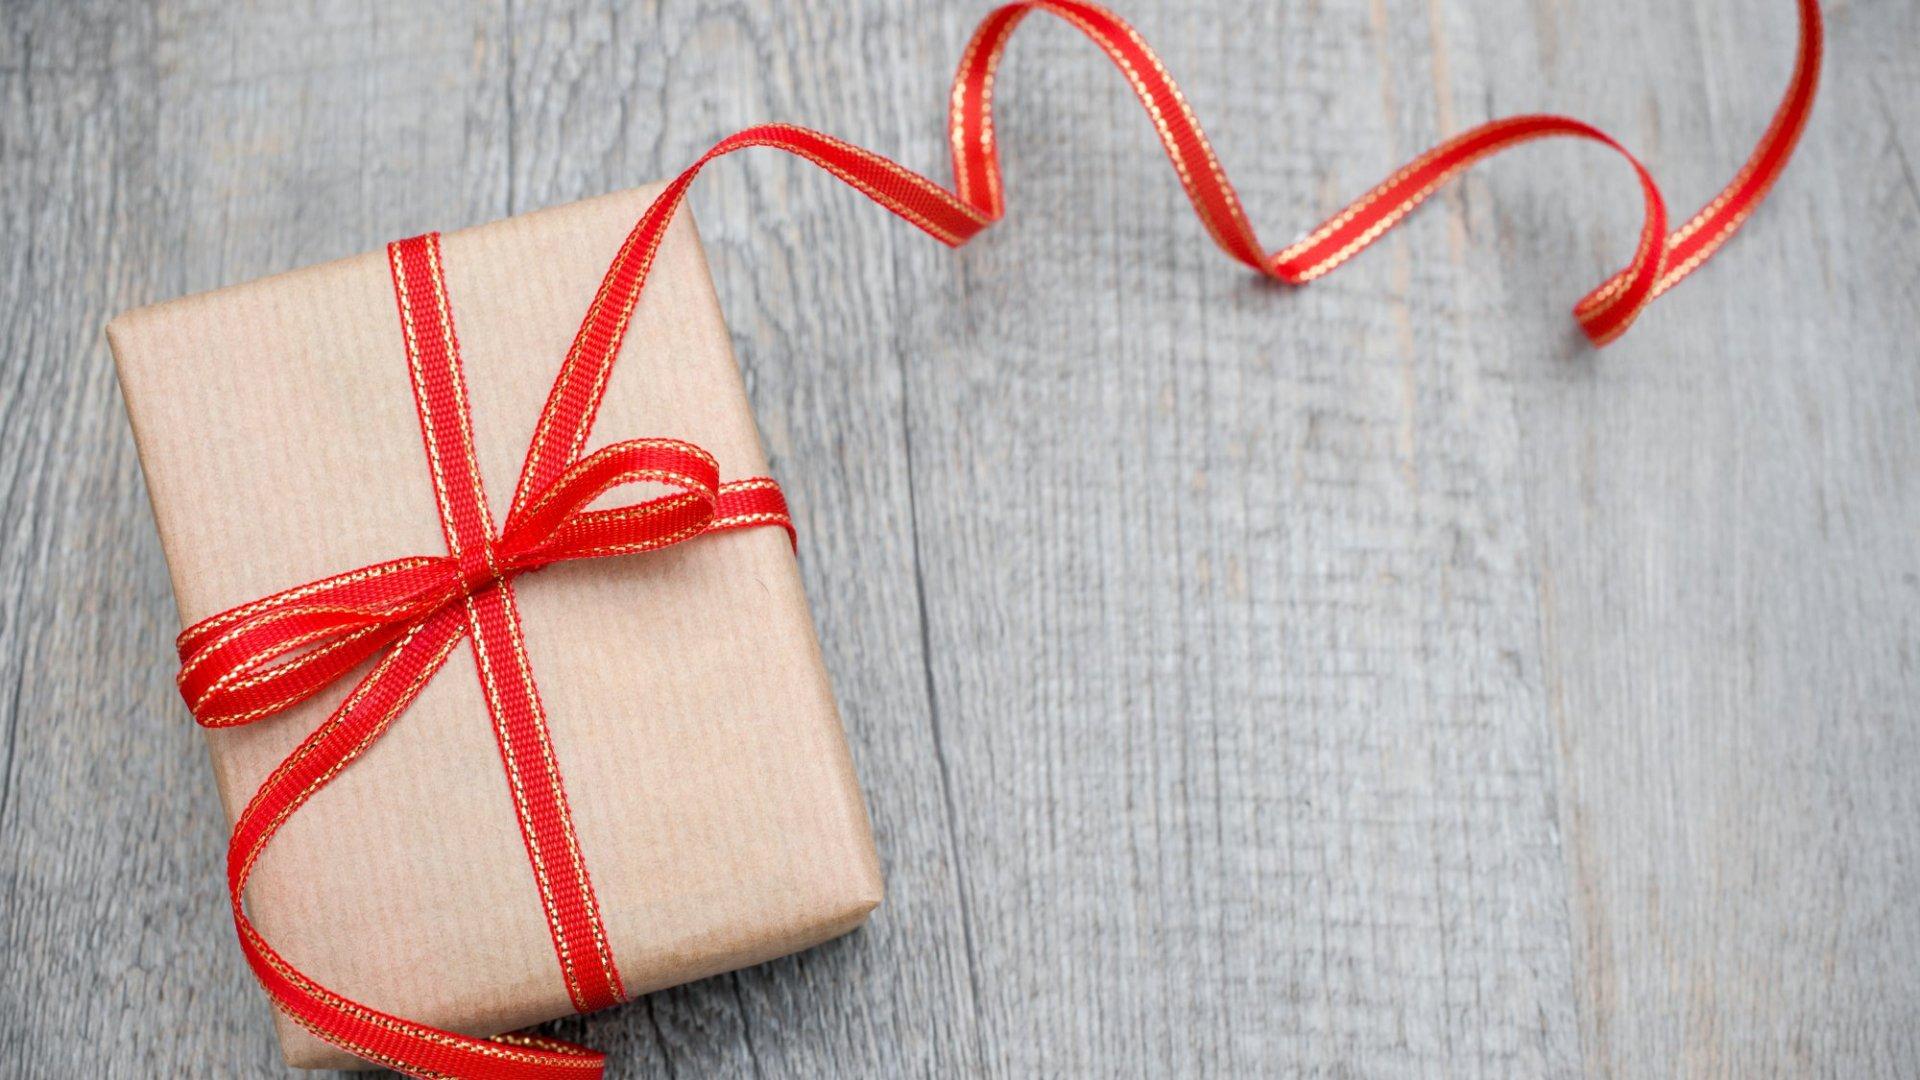 How to Avoid Productivity Slumps During the Holiday Season